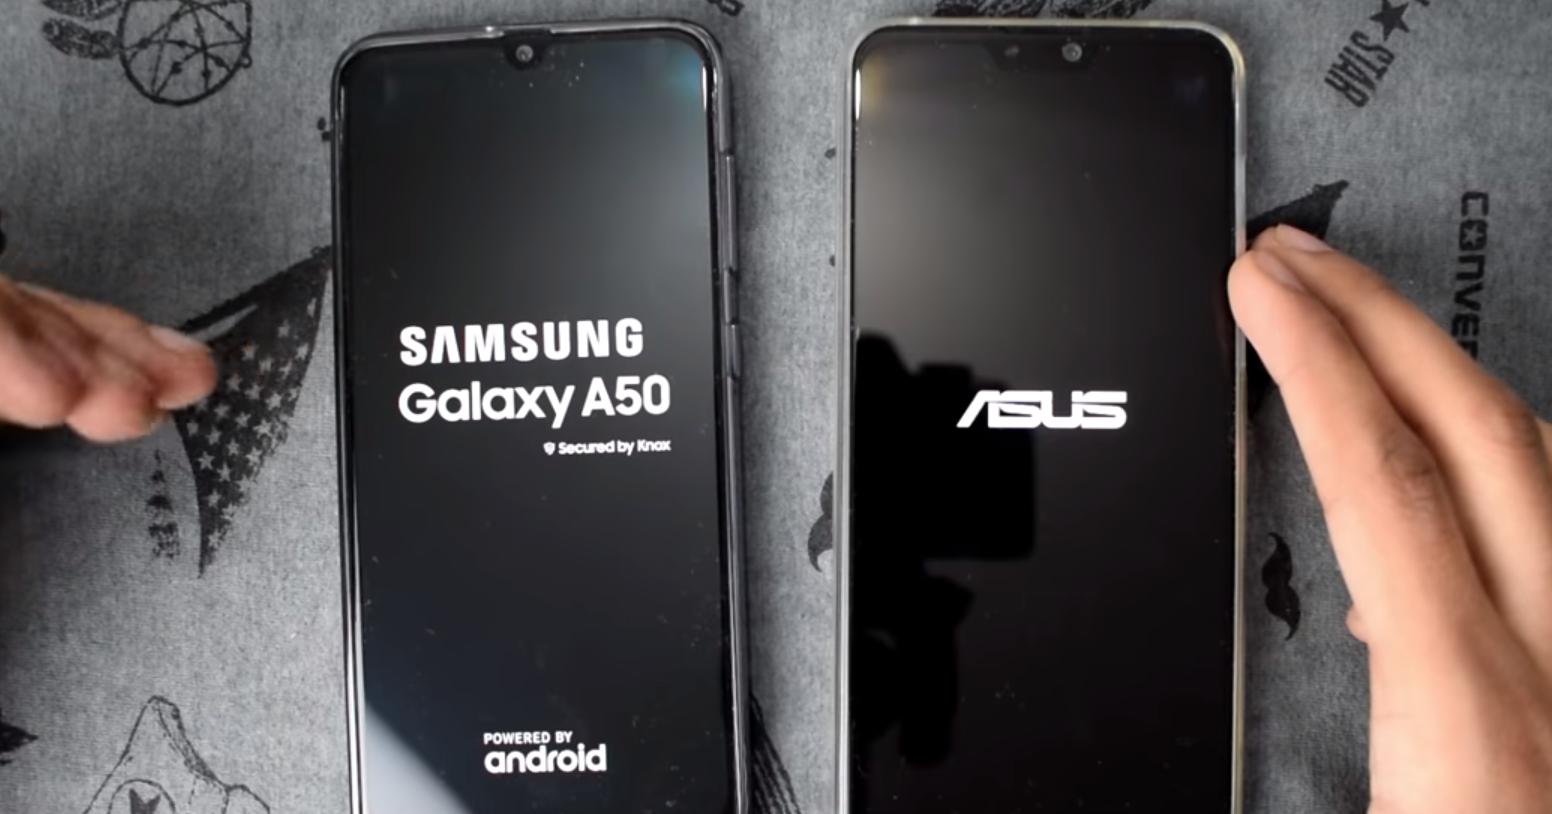 Samsung Galaxy A50 против Asus Zenfone Max Pro M2: тест на скорость